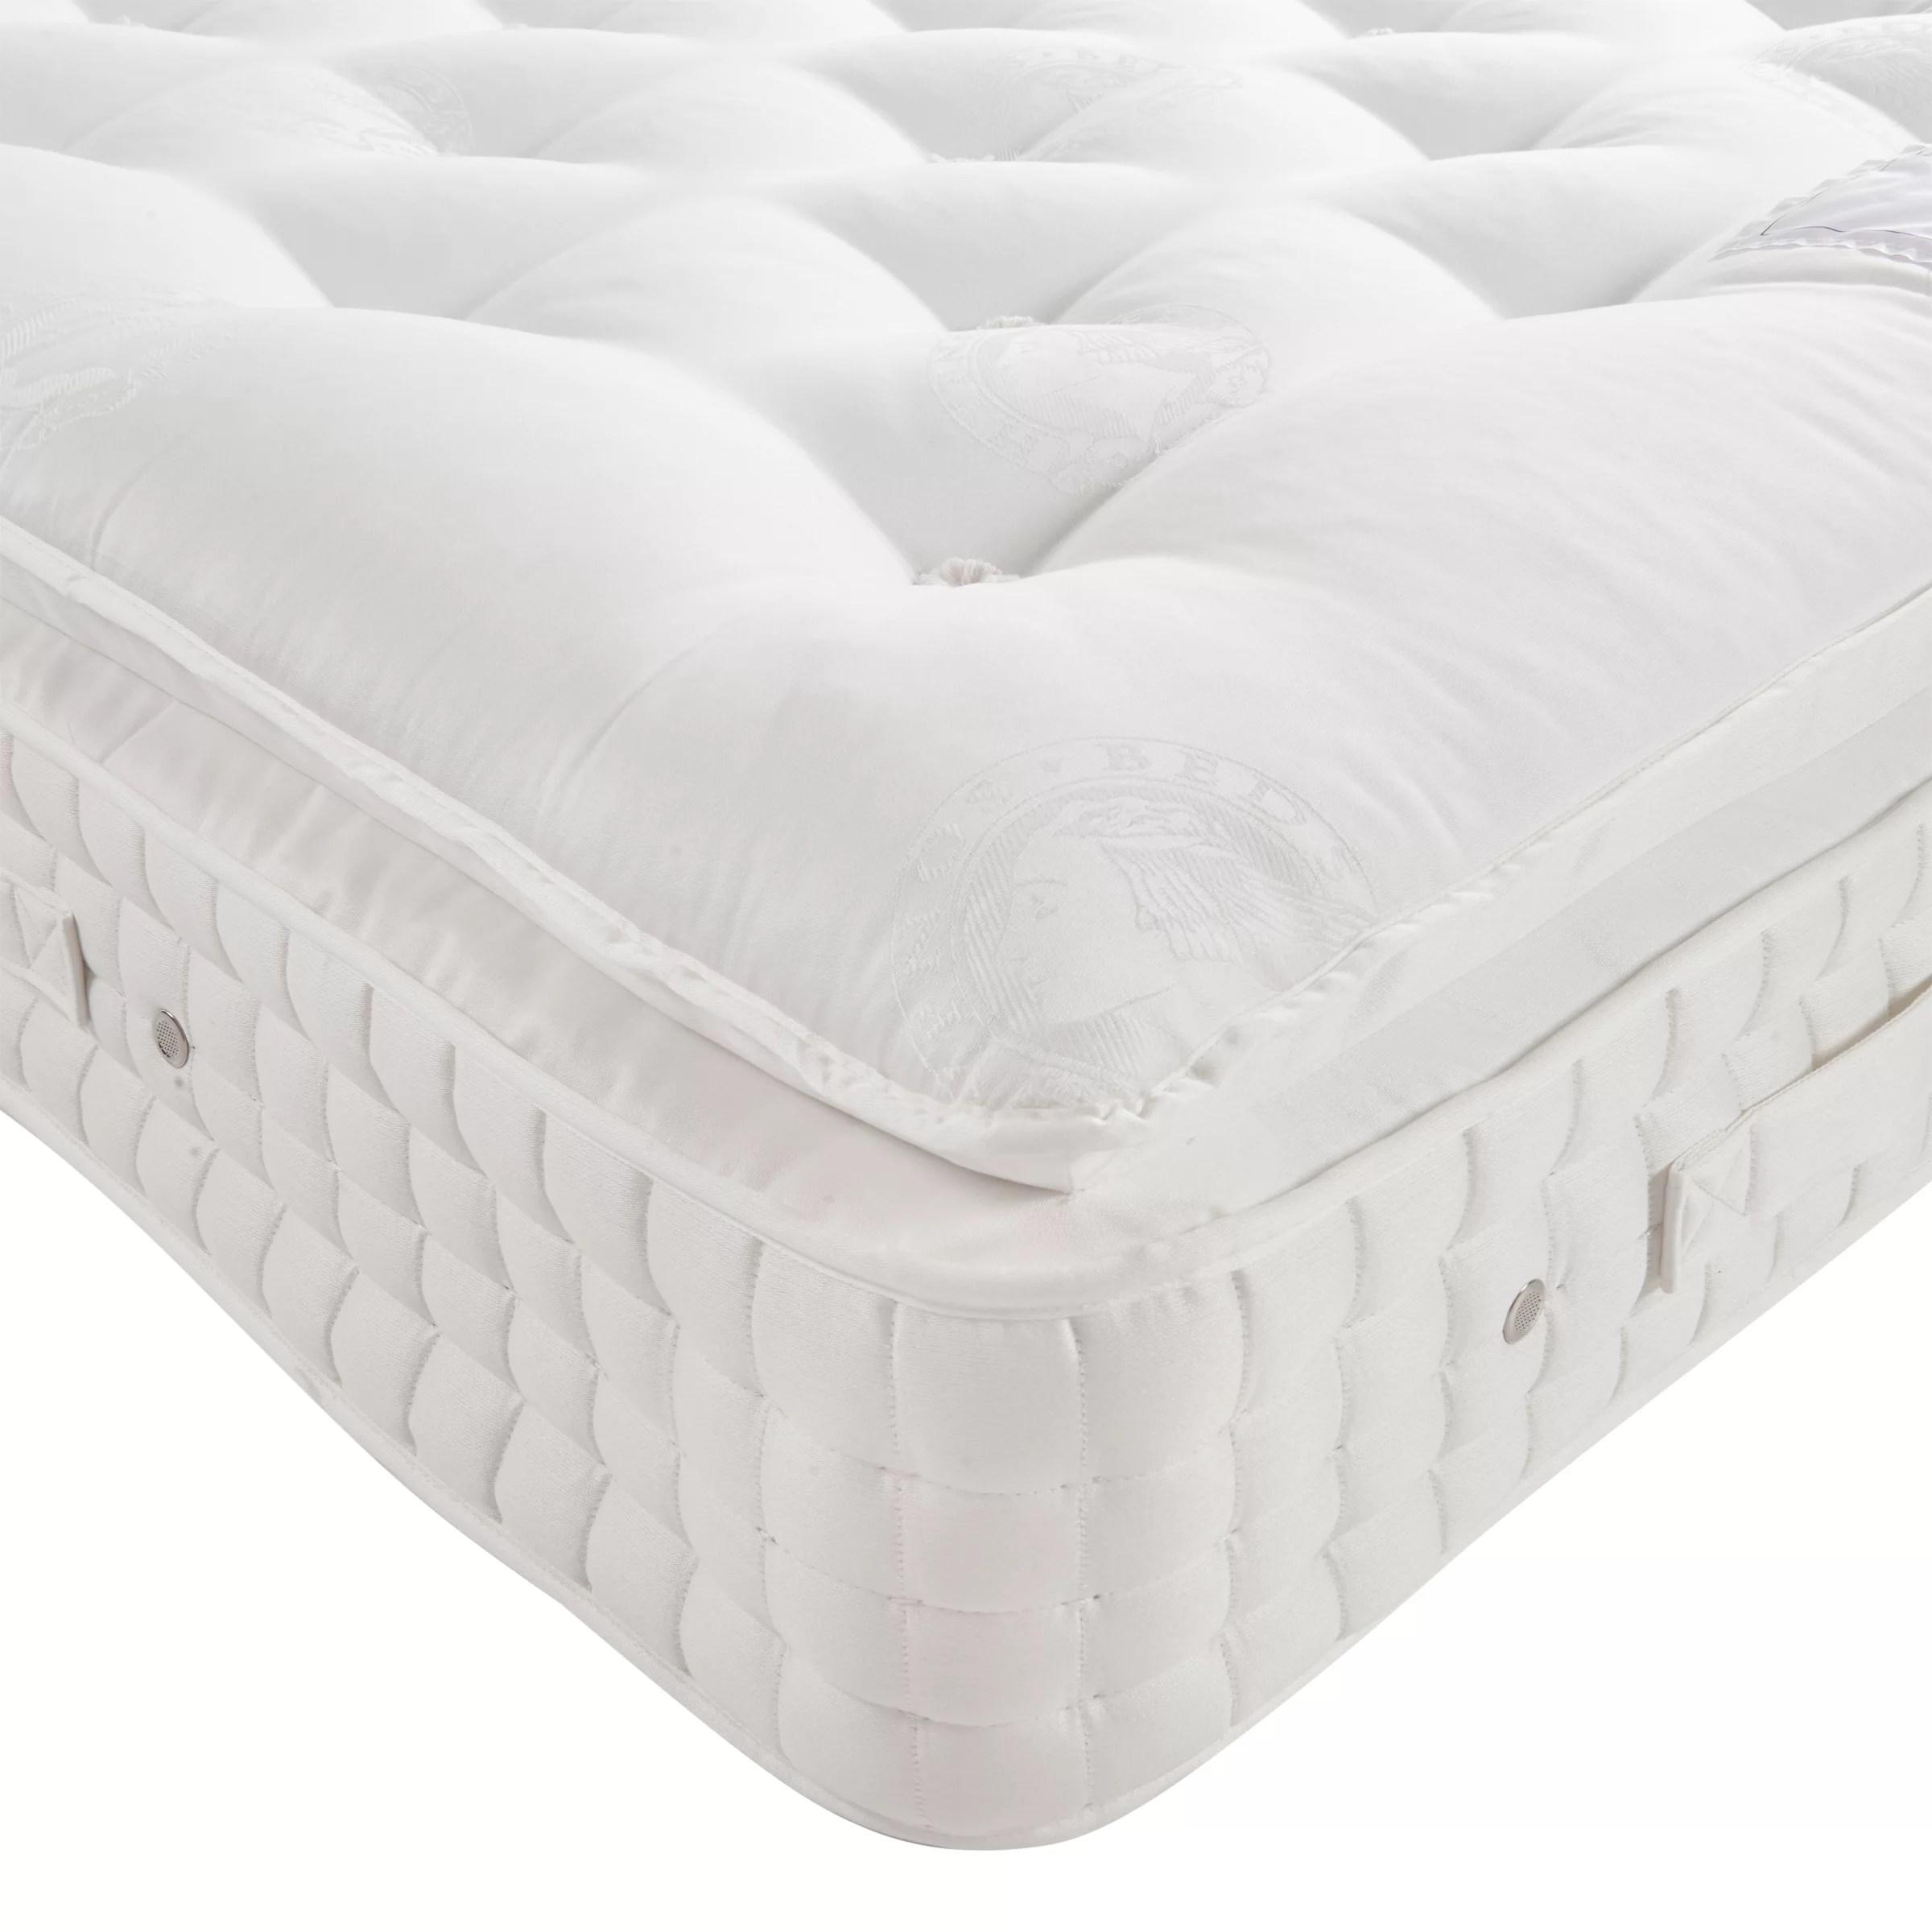 hypnos sublime pillowtop pocket spring mattress medium tension super king size